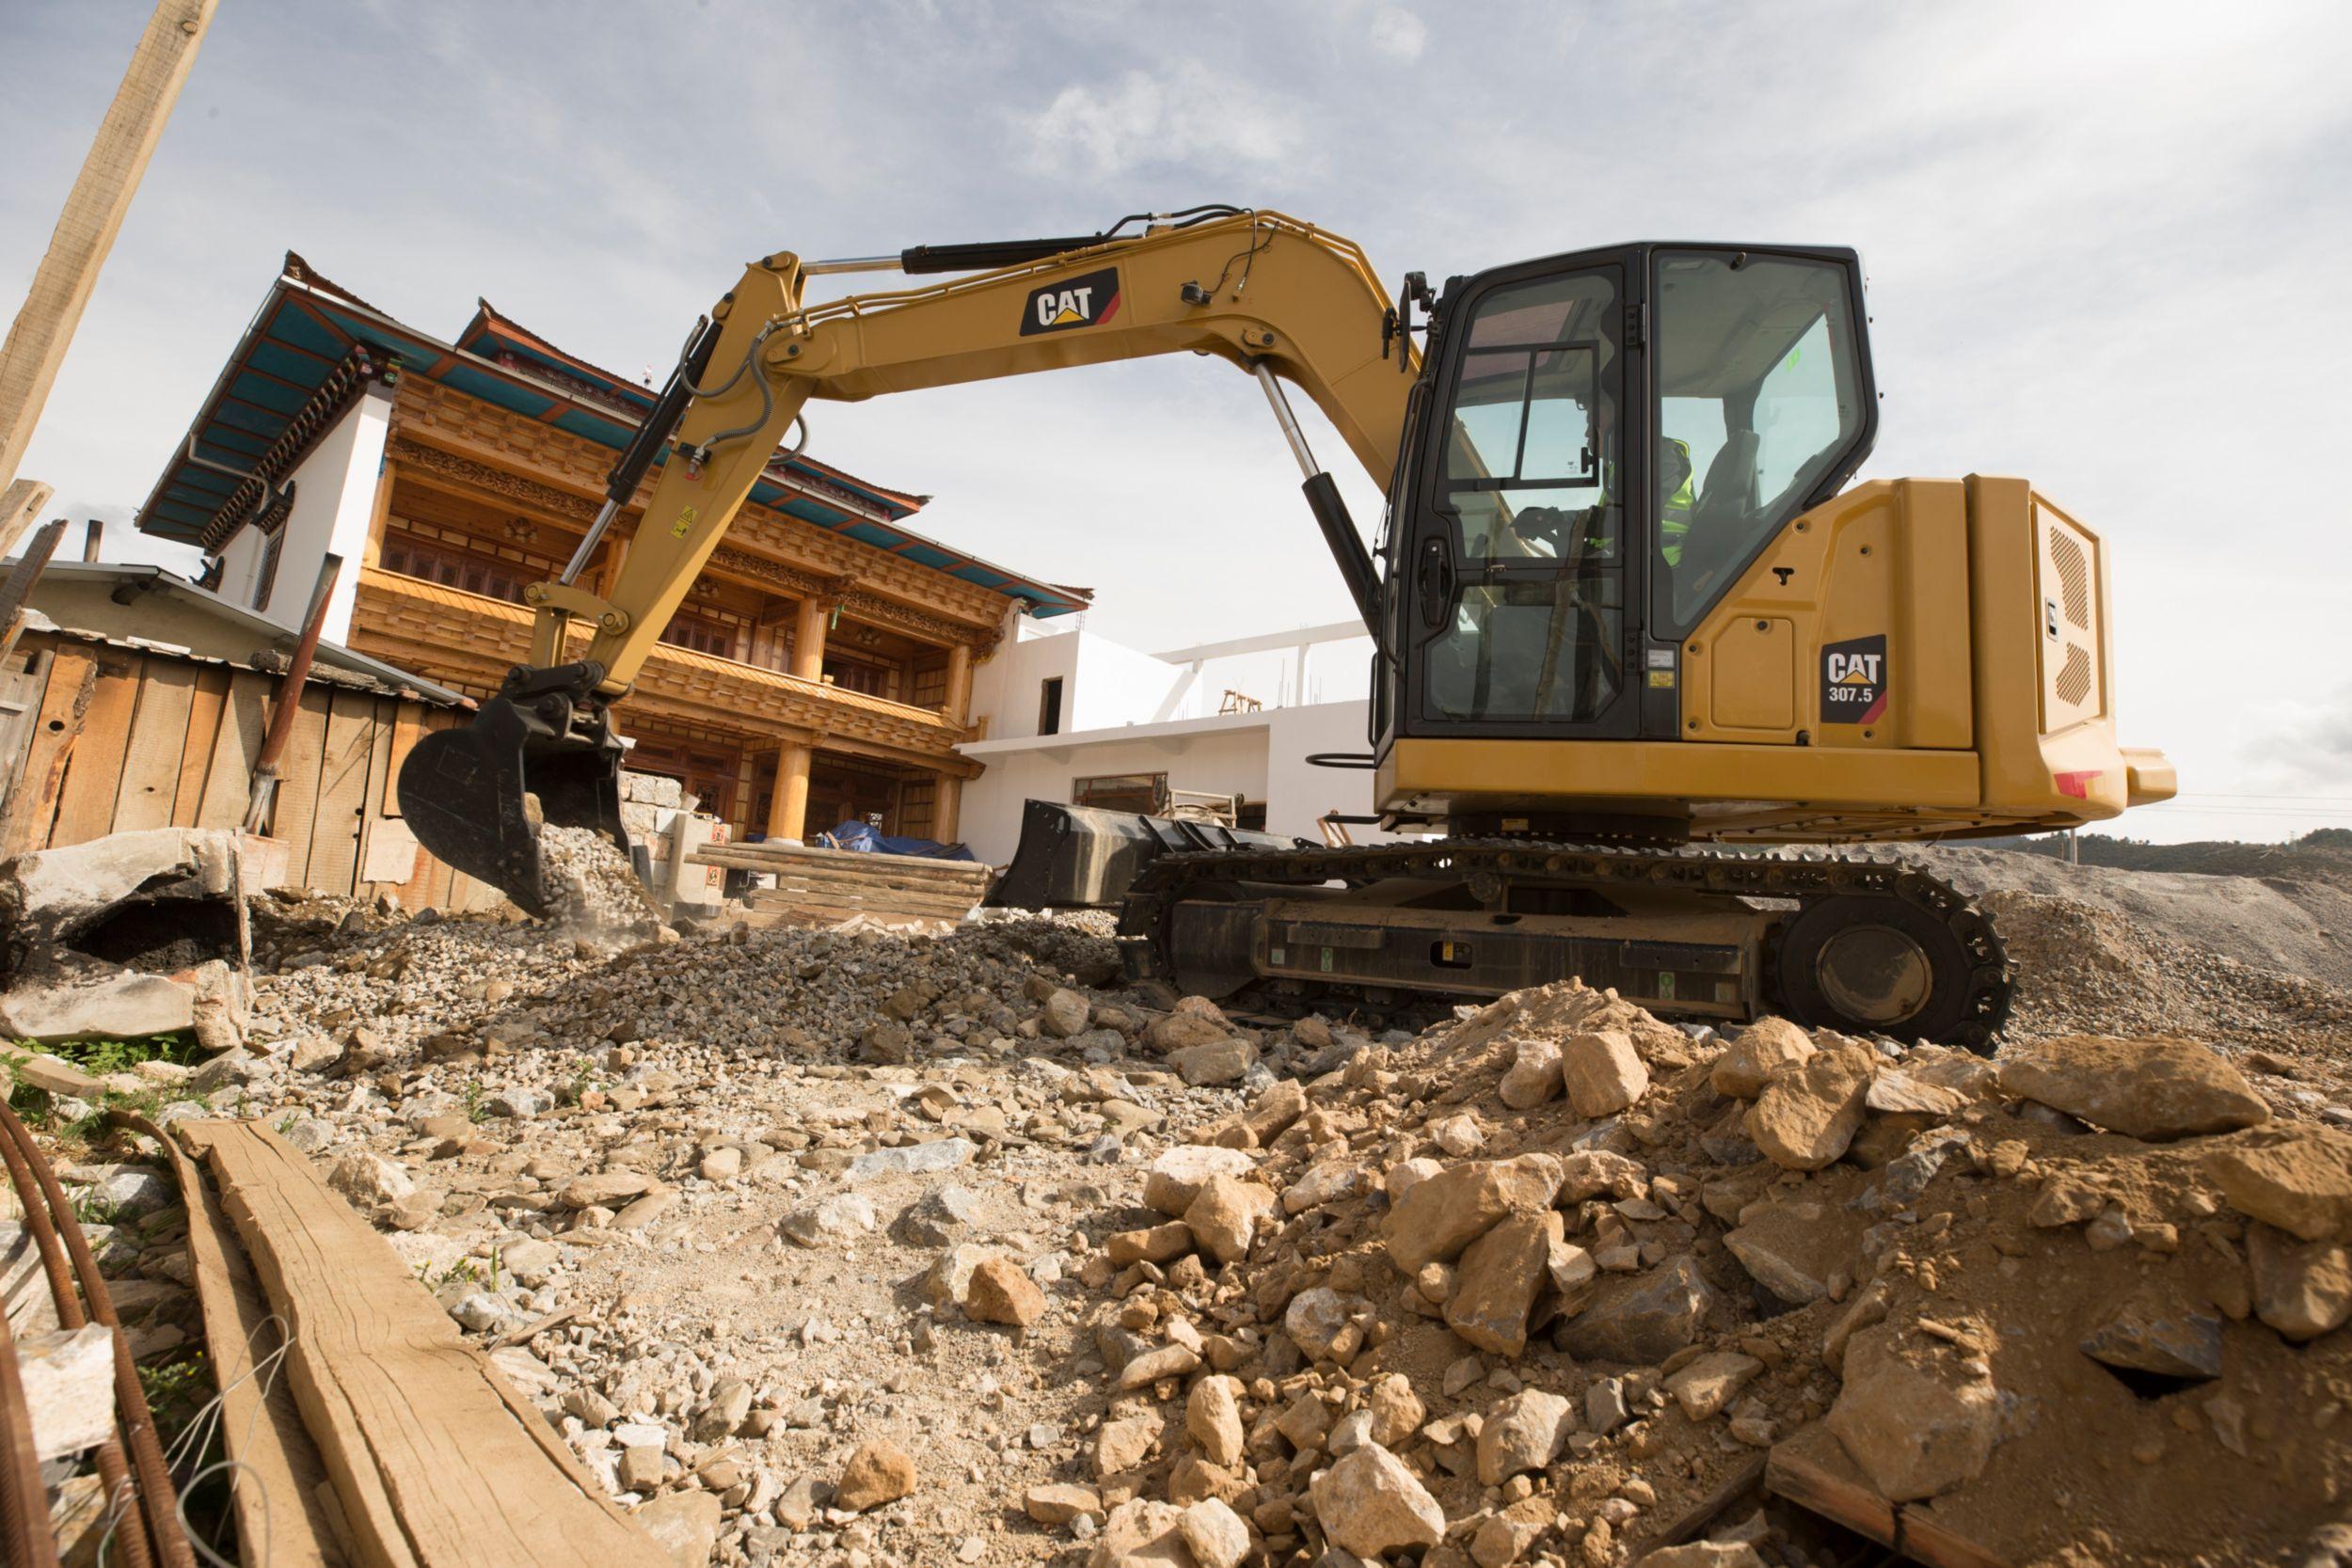 307.5 Mini Hydraulic Excavator>